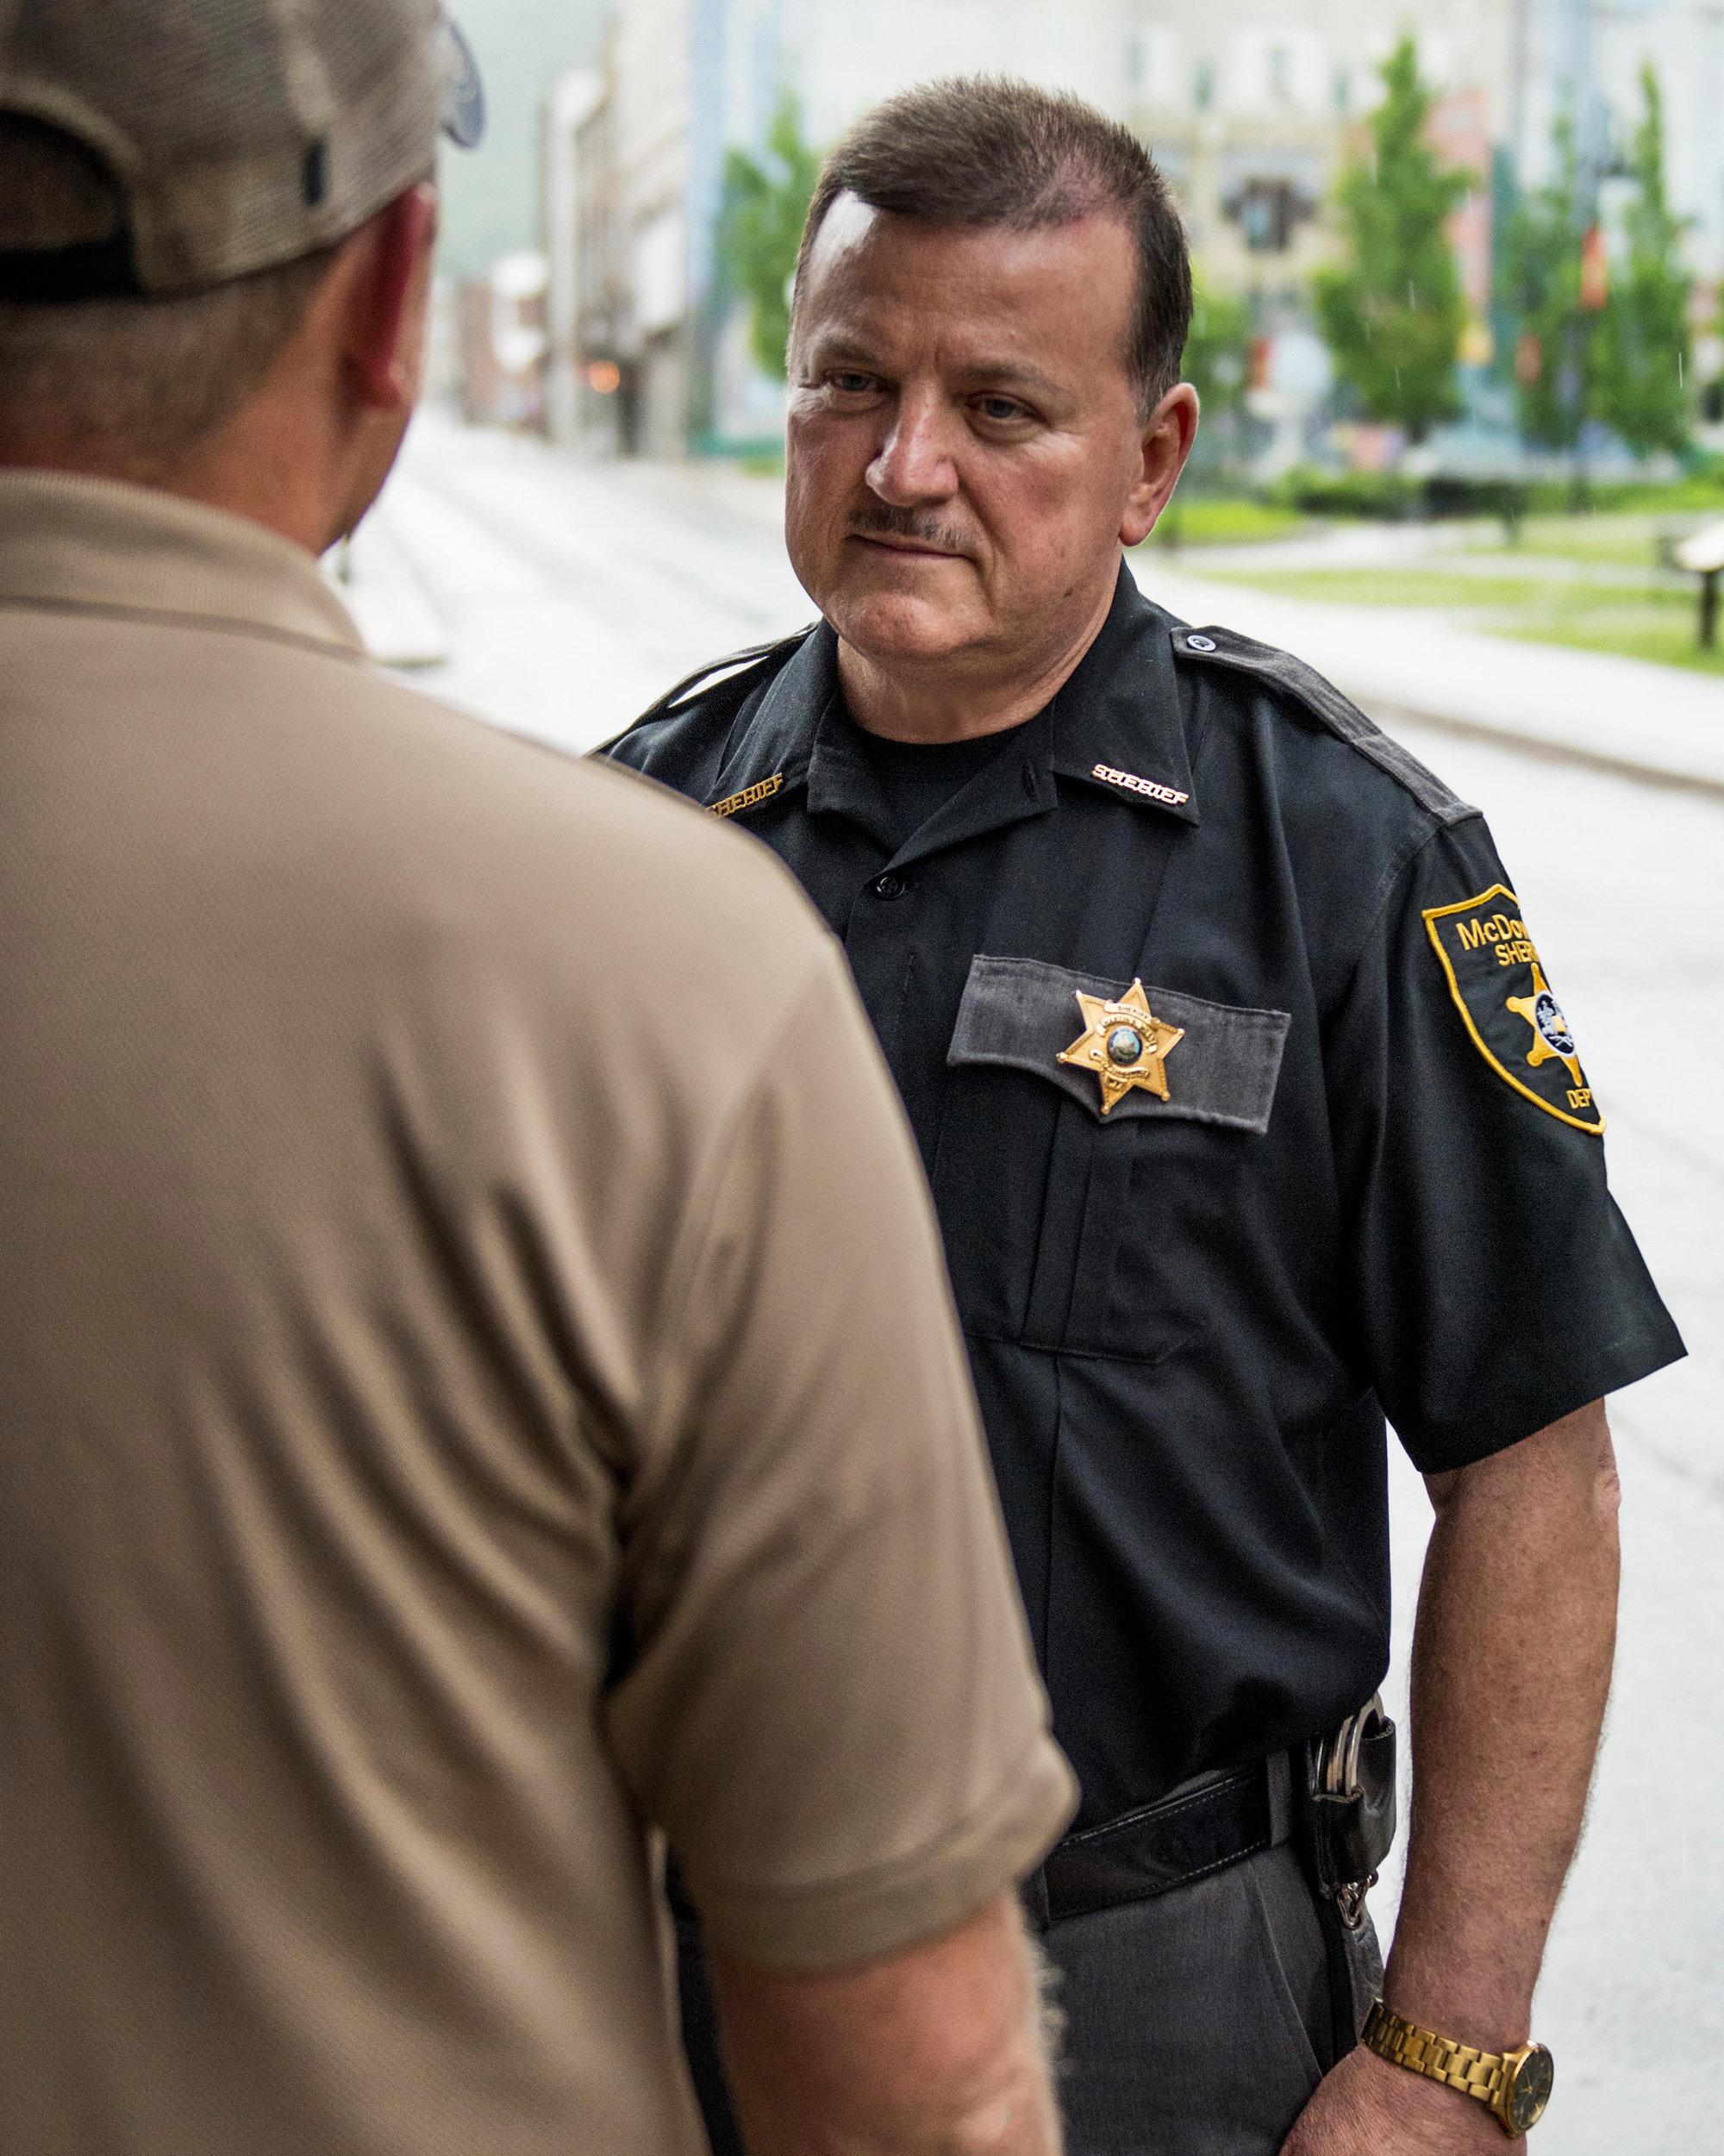 McDowell County Sheriff